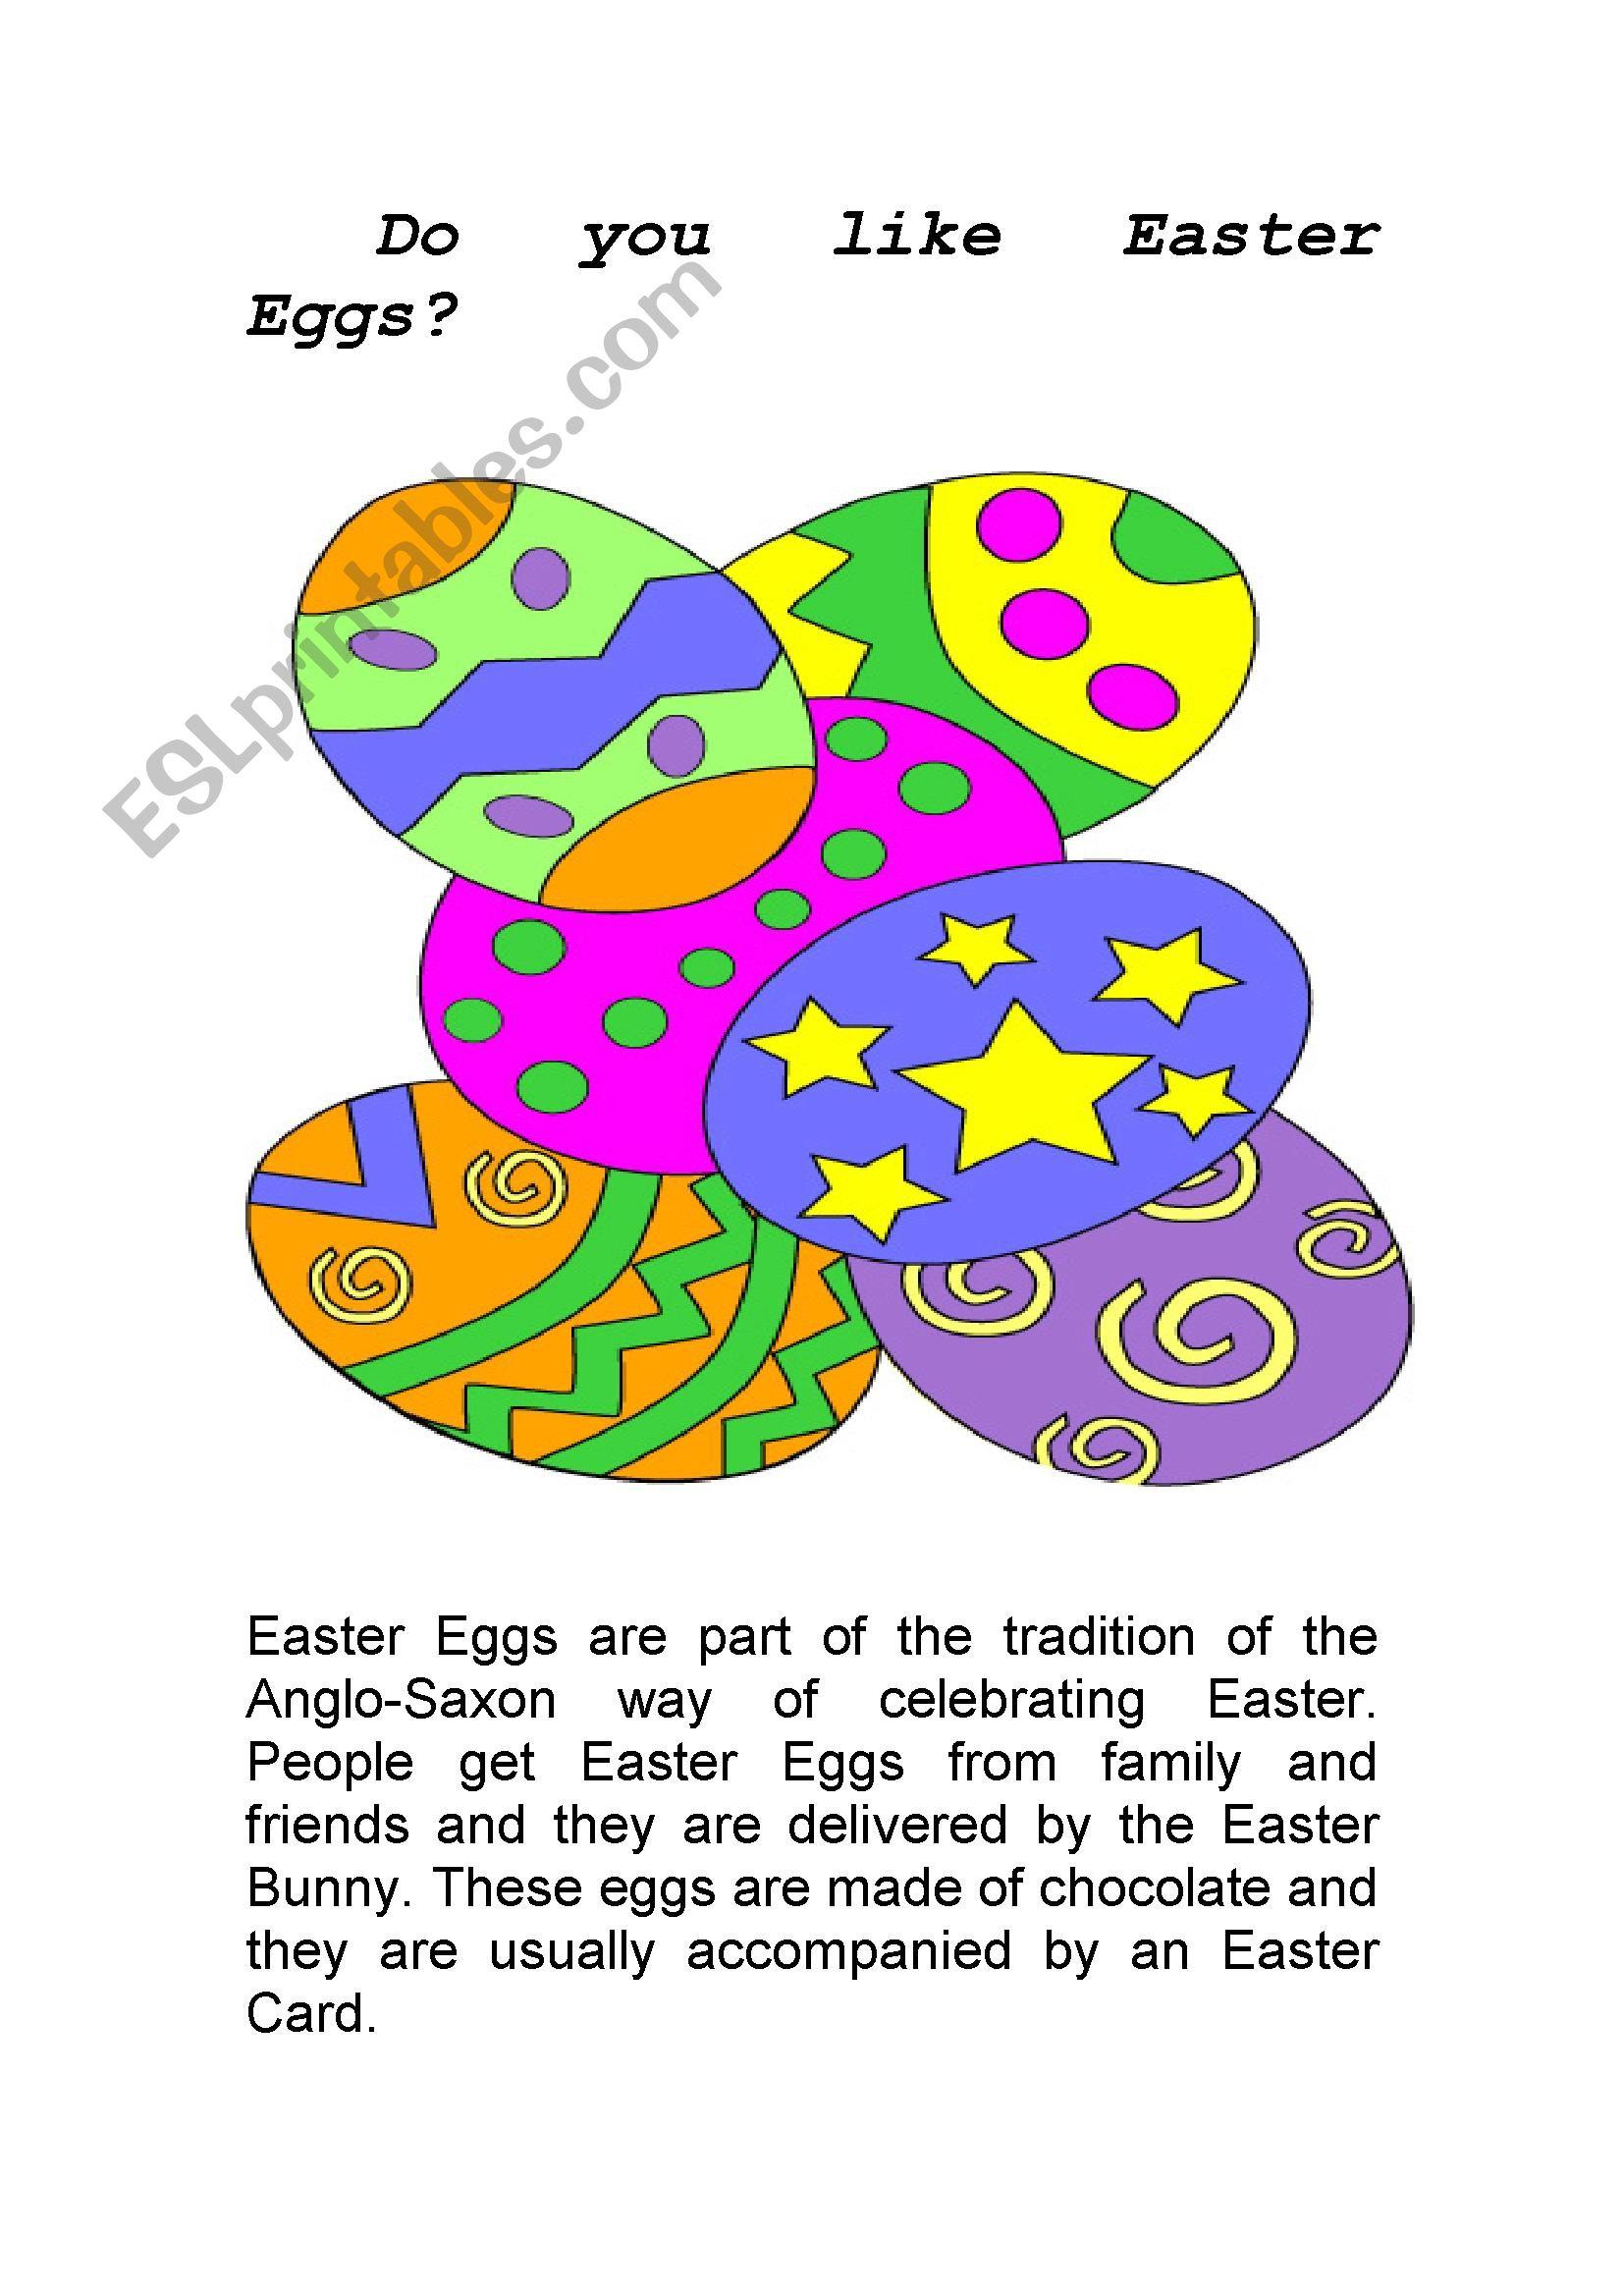 Do You Like Easter Eggs